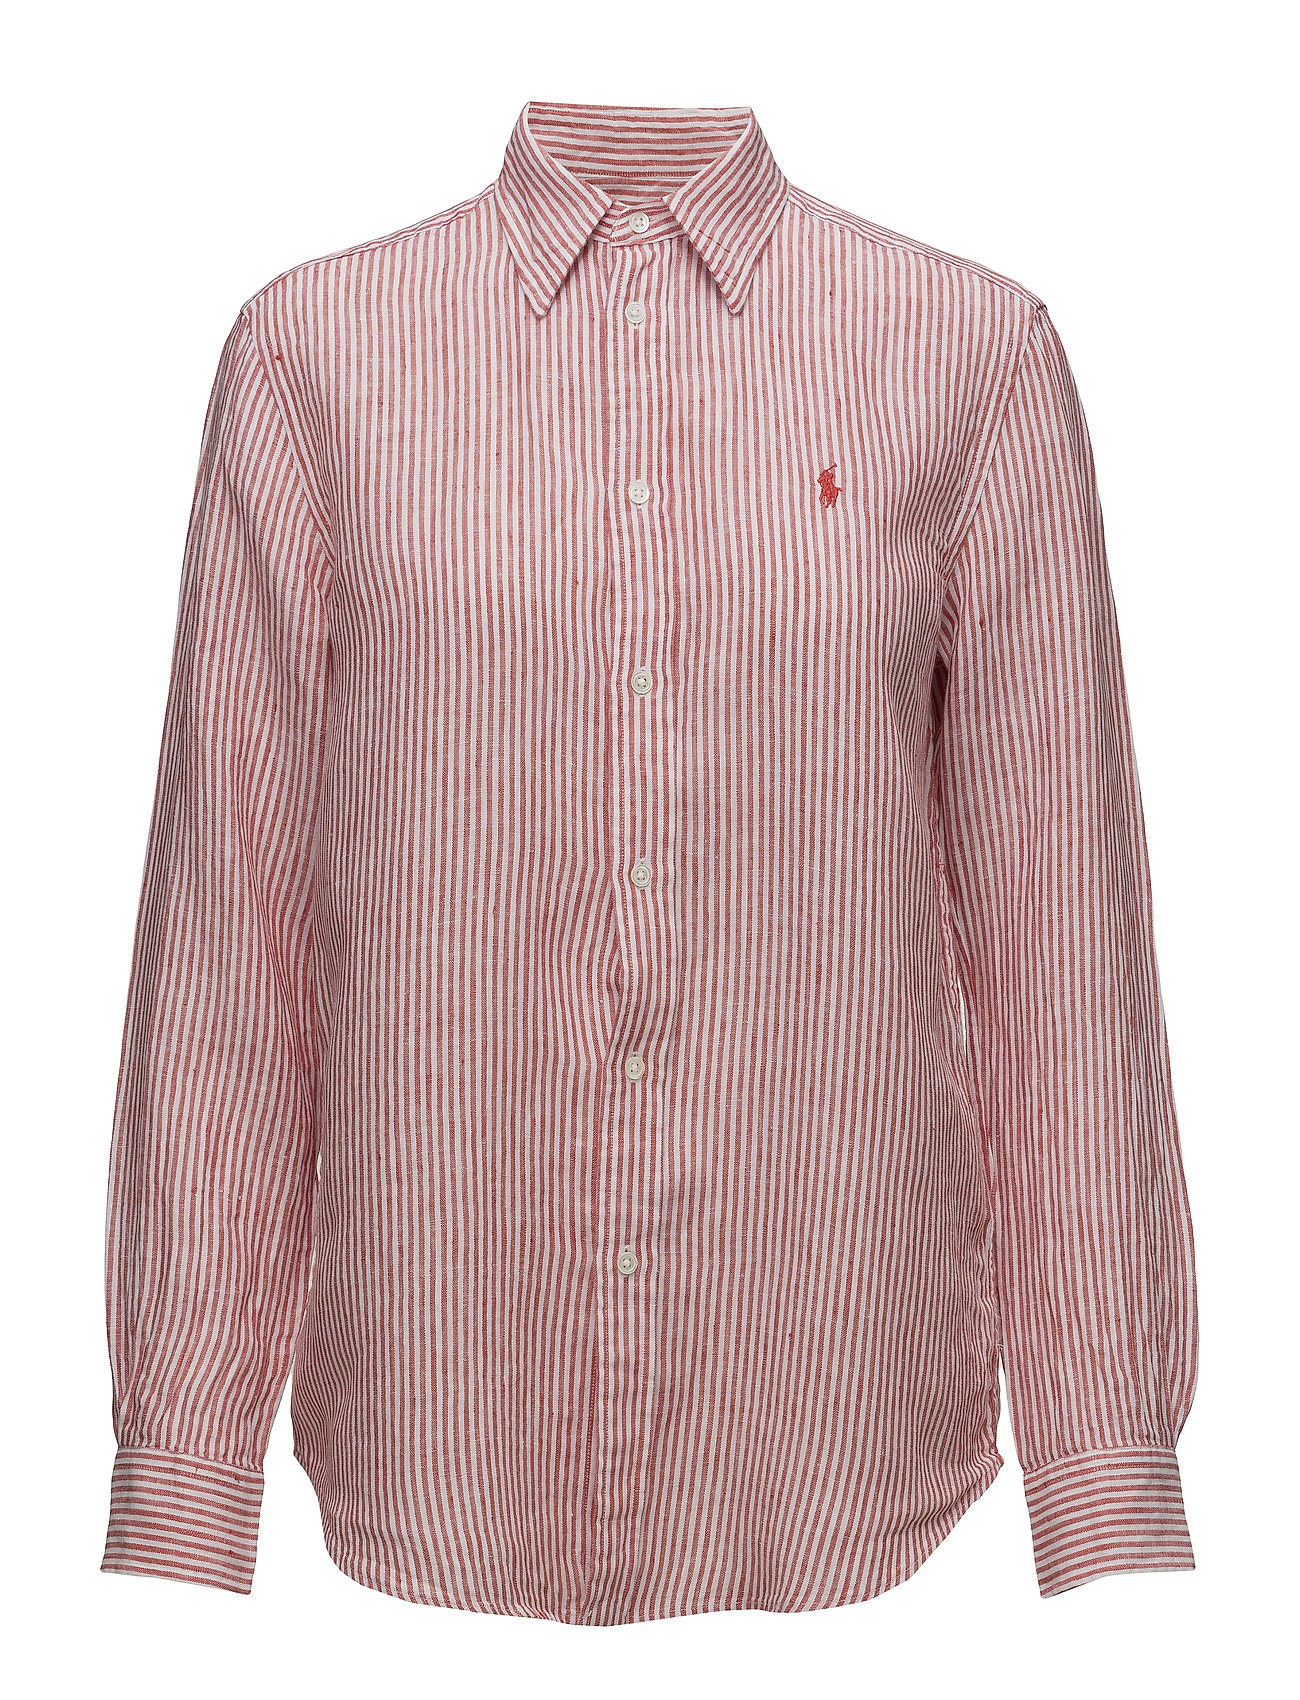 e2081181ab clearance polo ralph lauren relaxed striped linen shirt 4ef4c f6cd9